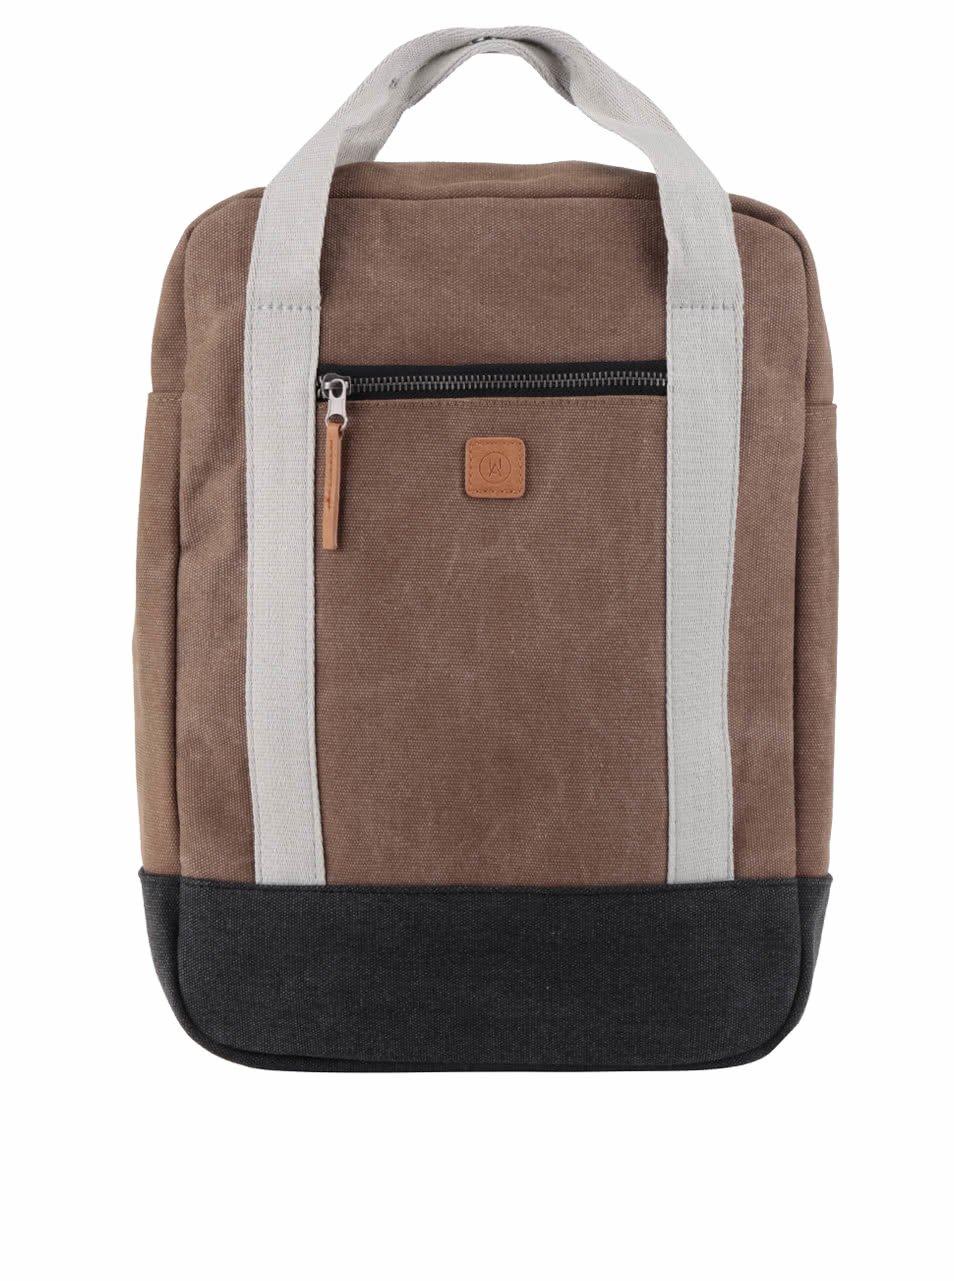 Krémovo-hnědý batoh Ucon Ison Waterproof 16 l